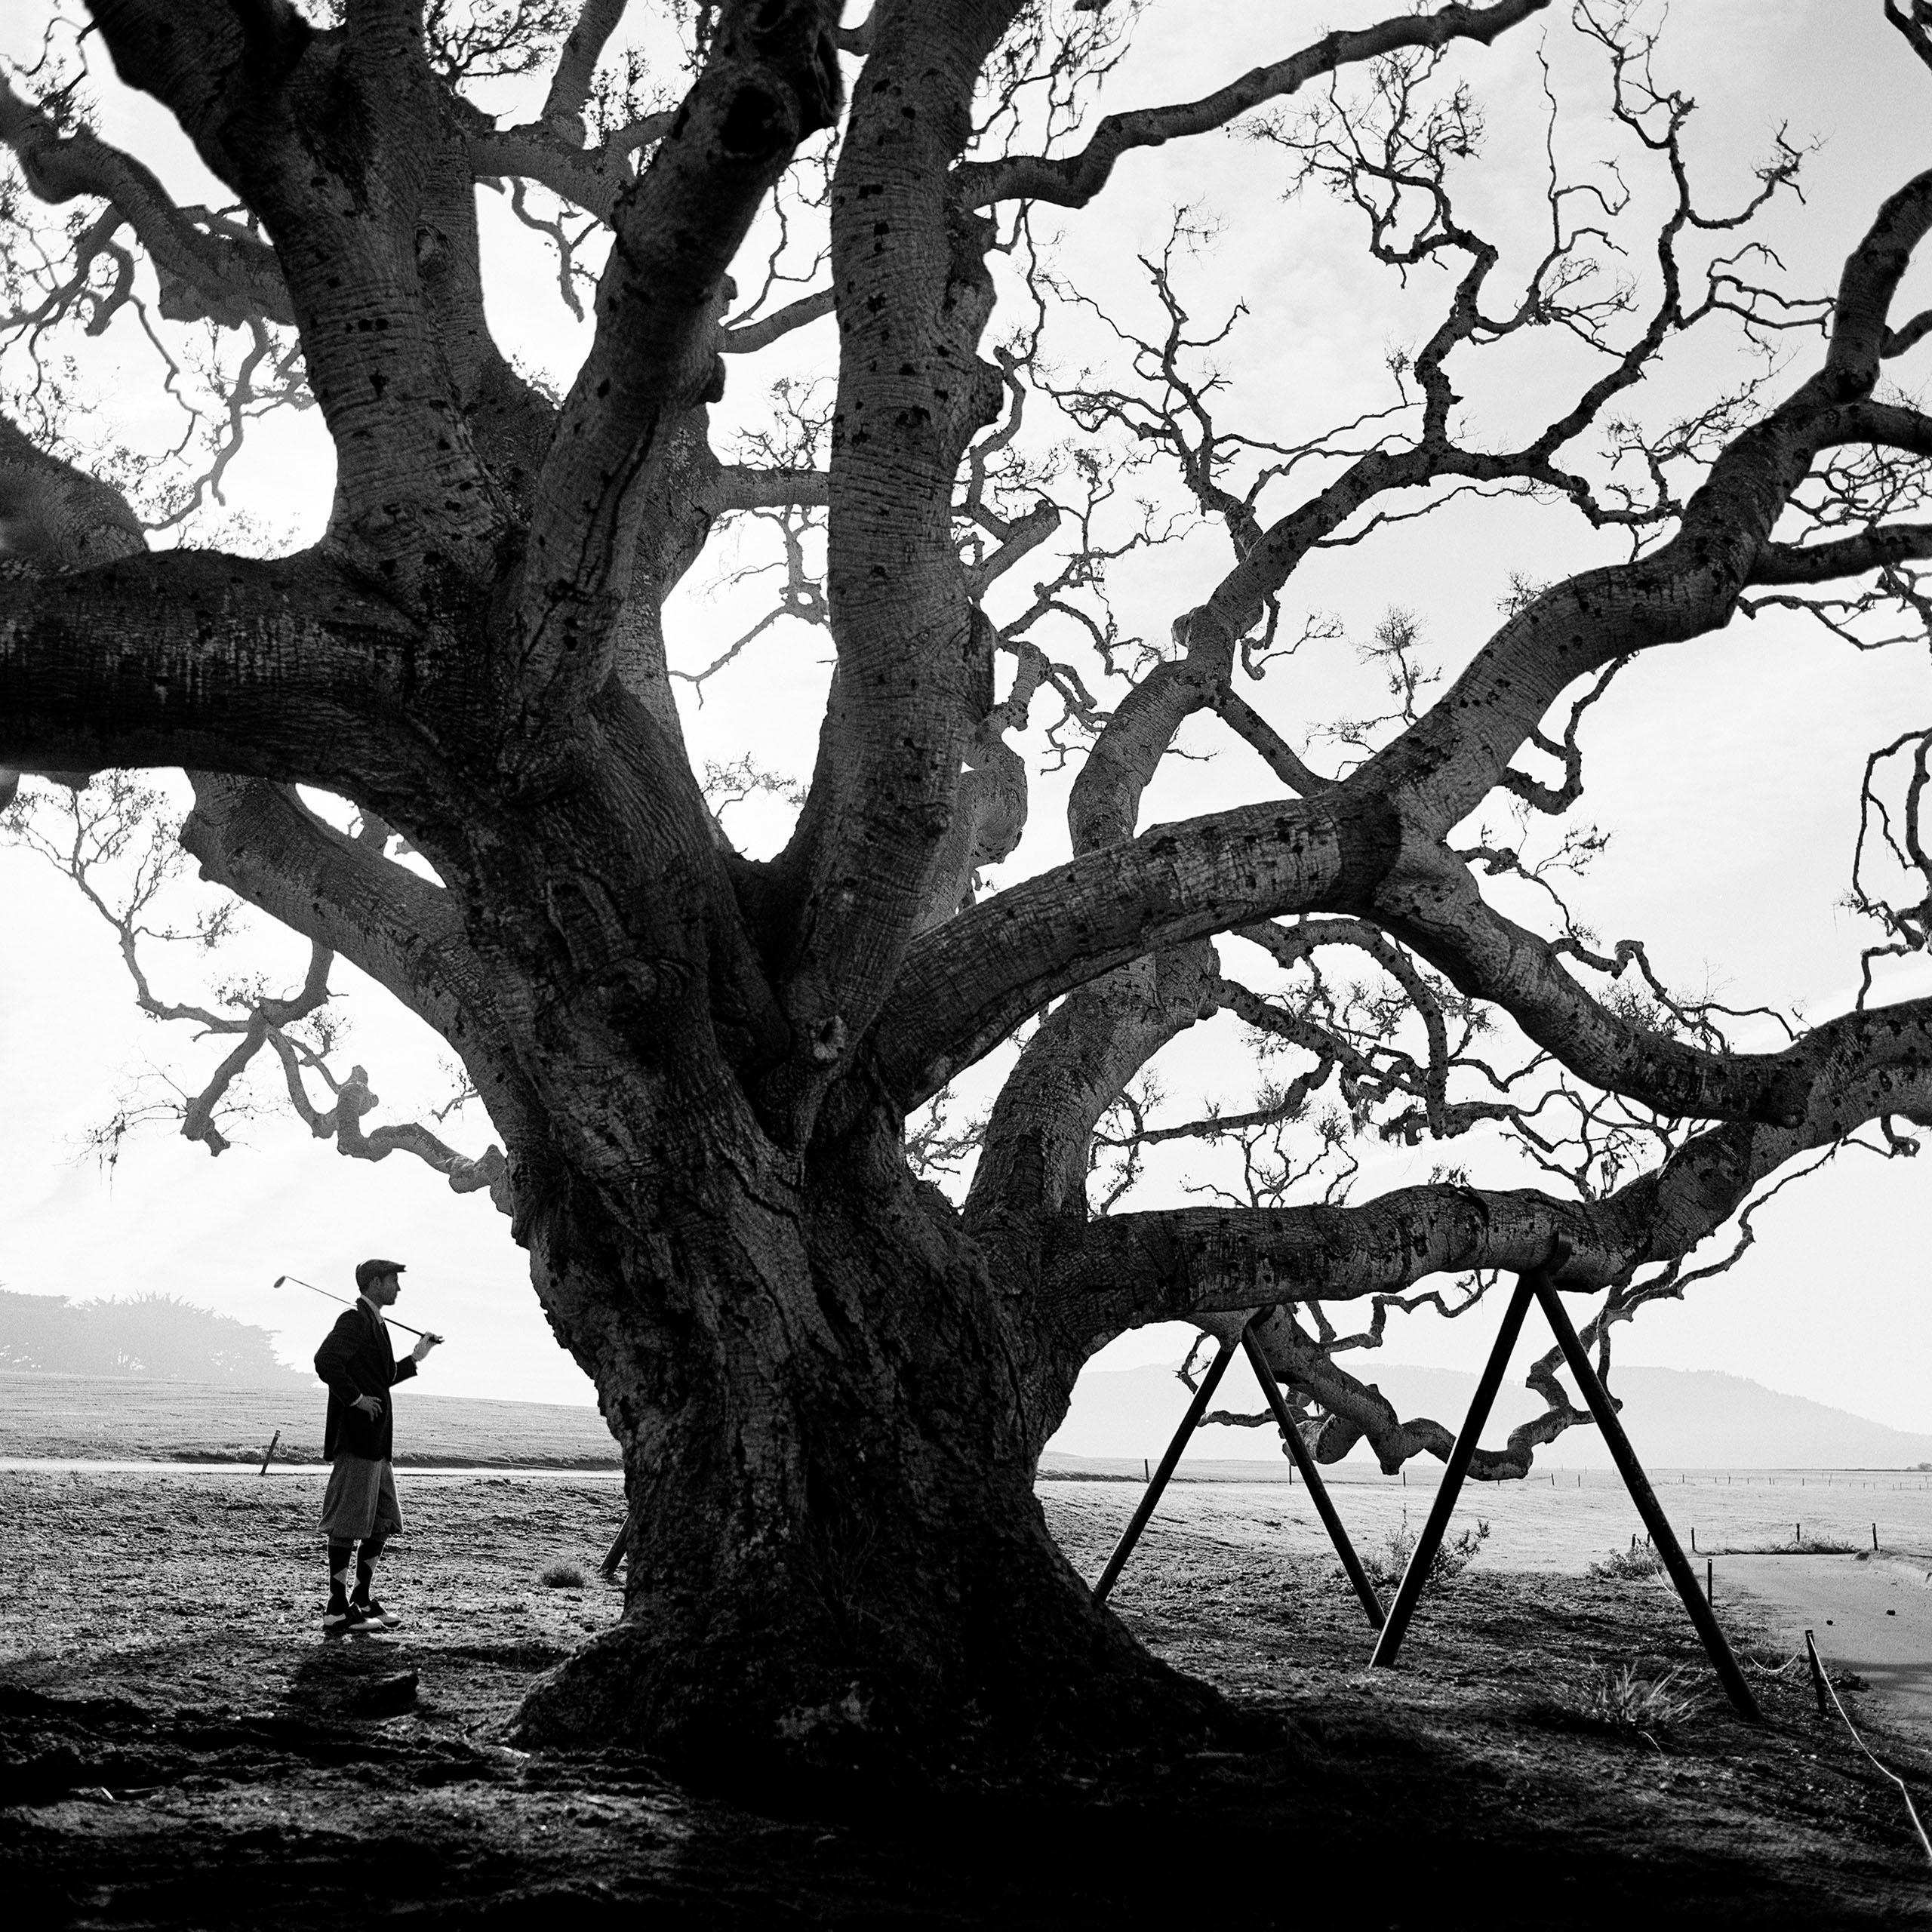 Pebble Beach tree, 1998